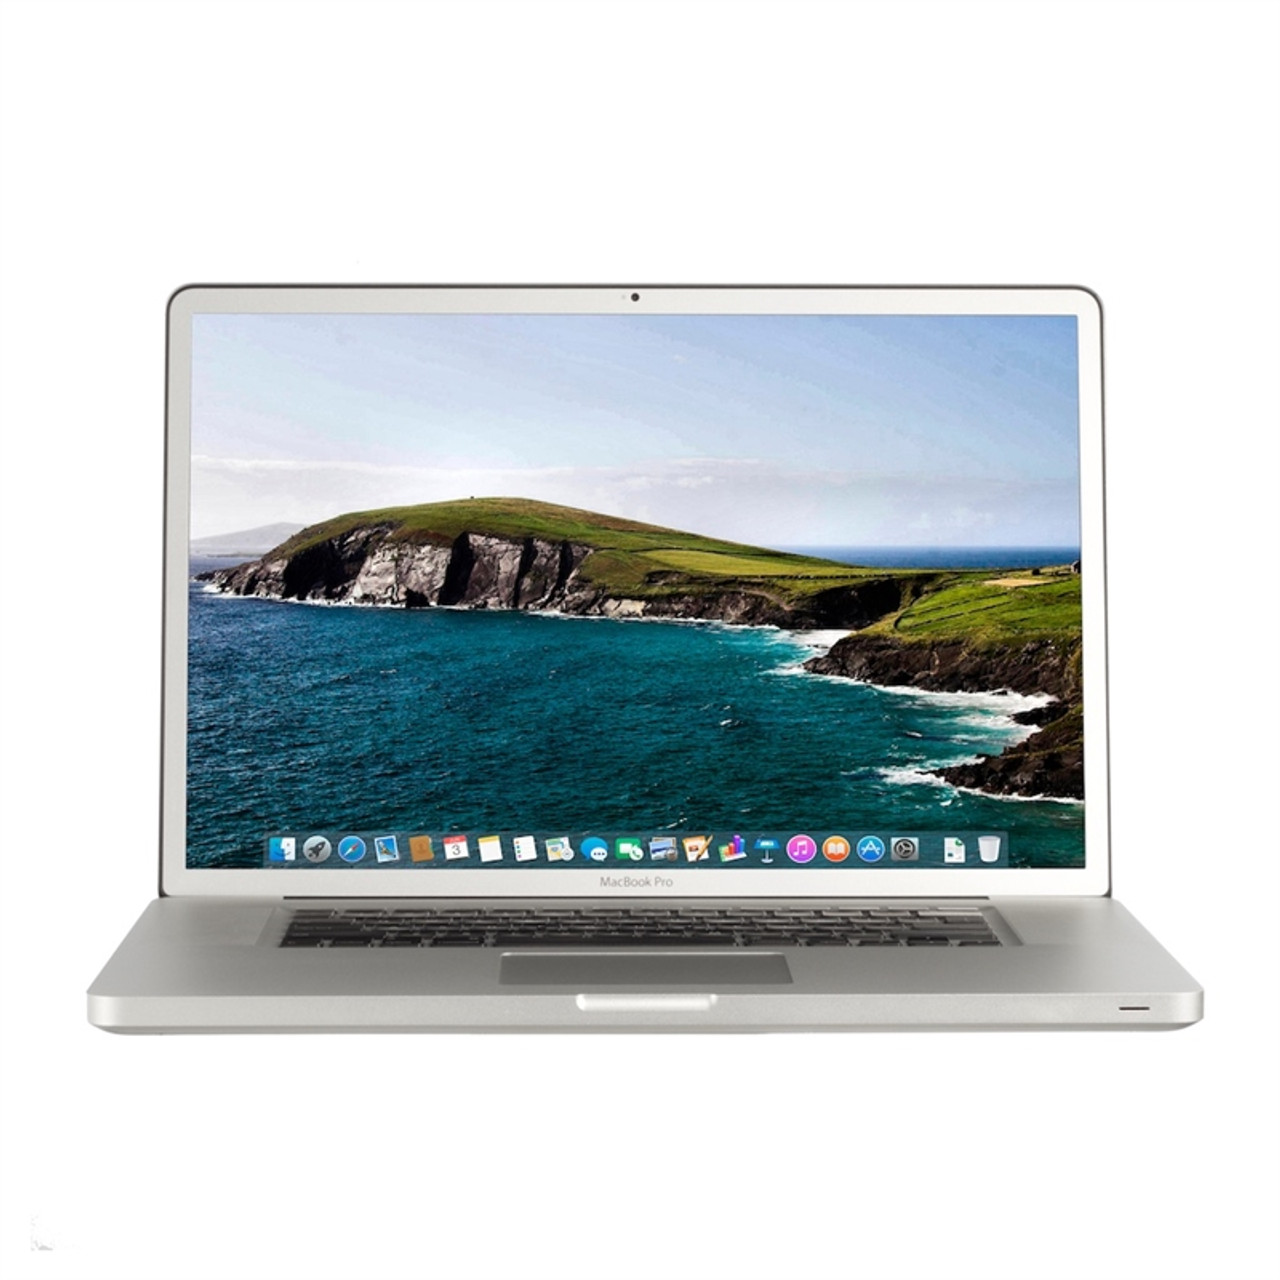 Vintage: Apple MacBook Pro 1-inch (Hi-Res Antiglare) 1.1GHz Core i1 (Mid  1010) MC014LL/A - Good Condition